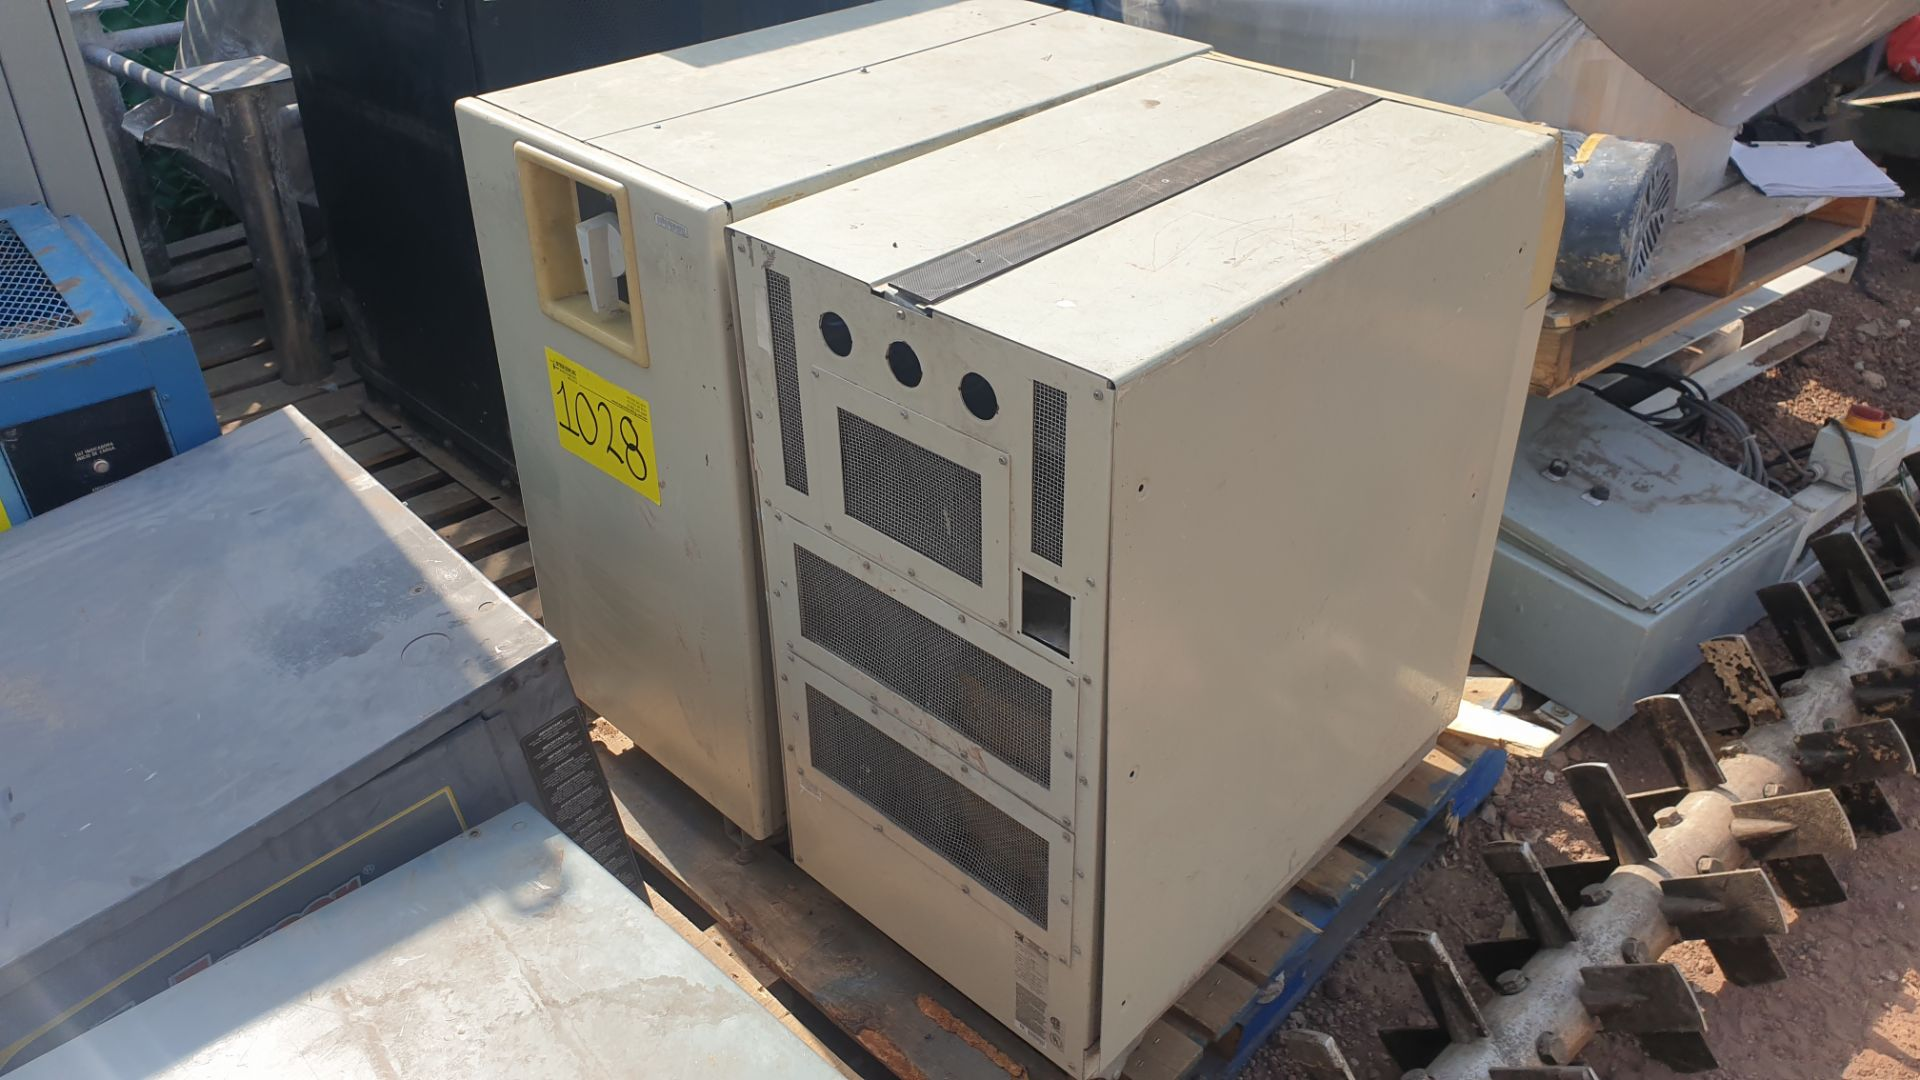 1 Ferrups Power bank system model FD10KVA 208-240V includes Lortec UPS of 3KVA - Image 7 of 11